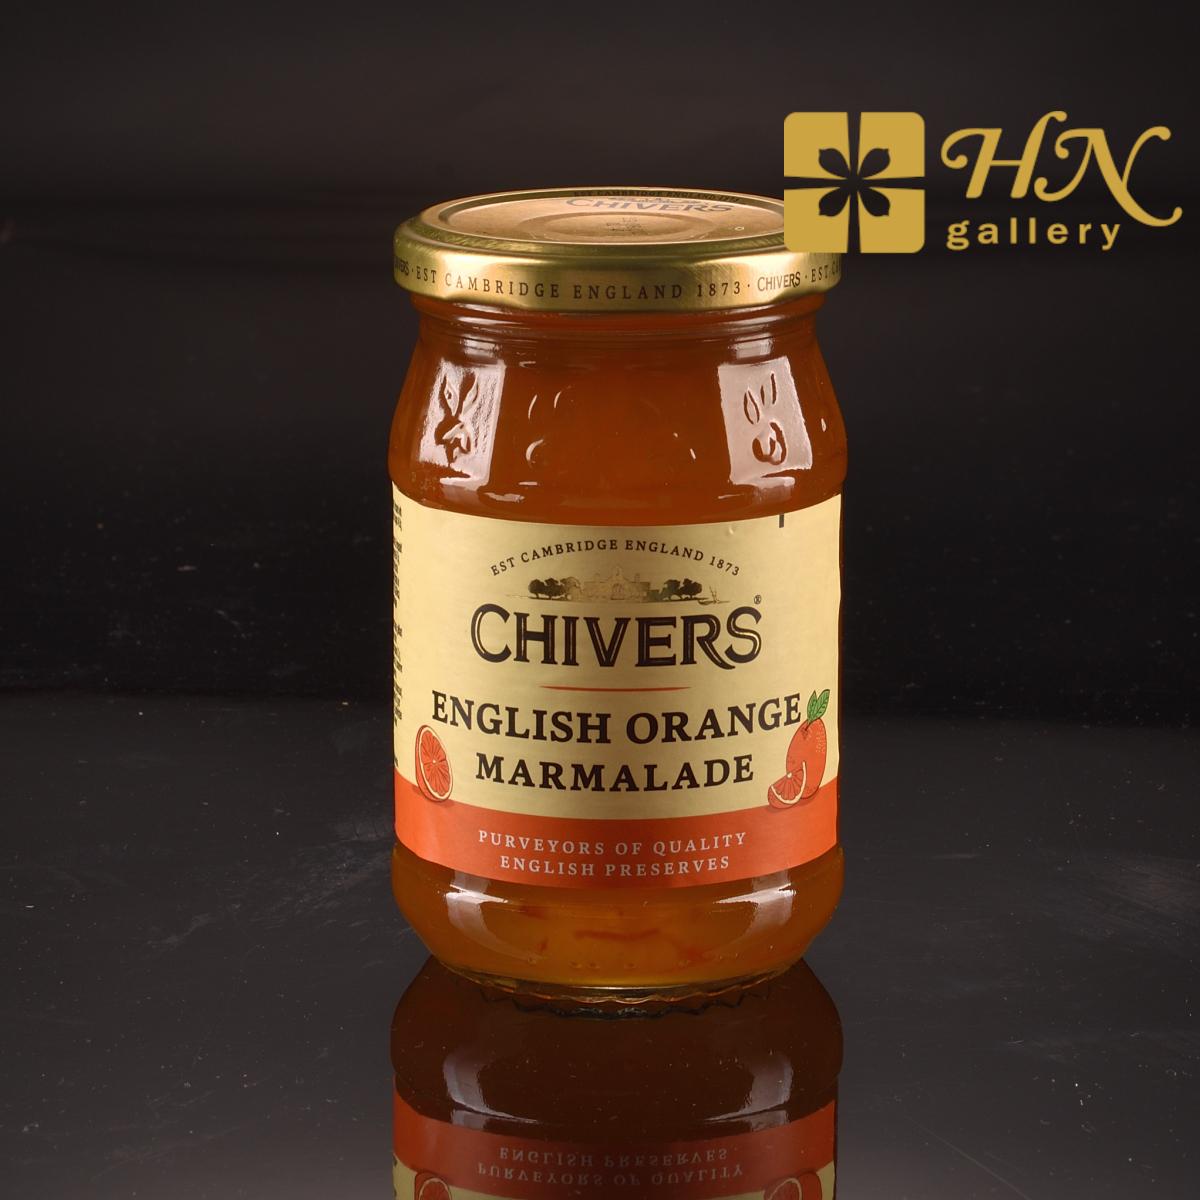 Chivers English Orange Marmalade Jam 340g